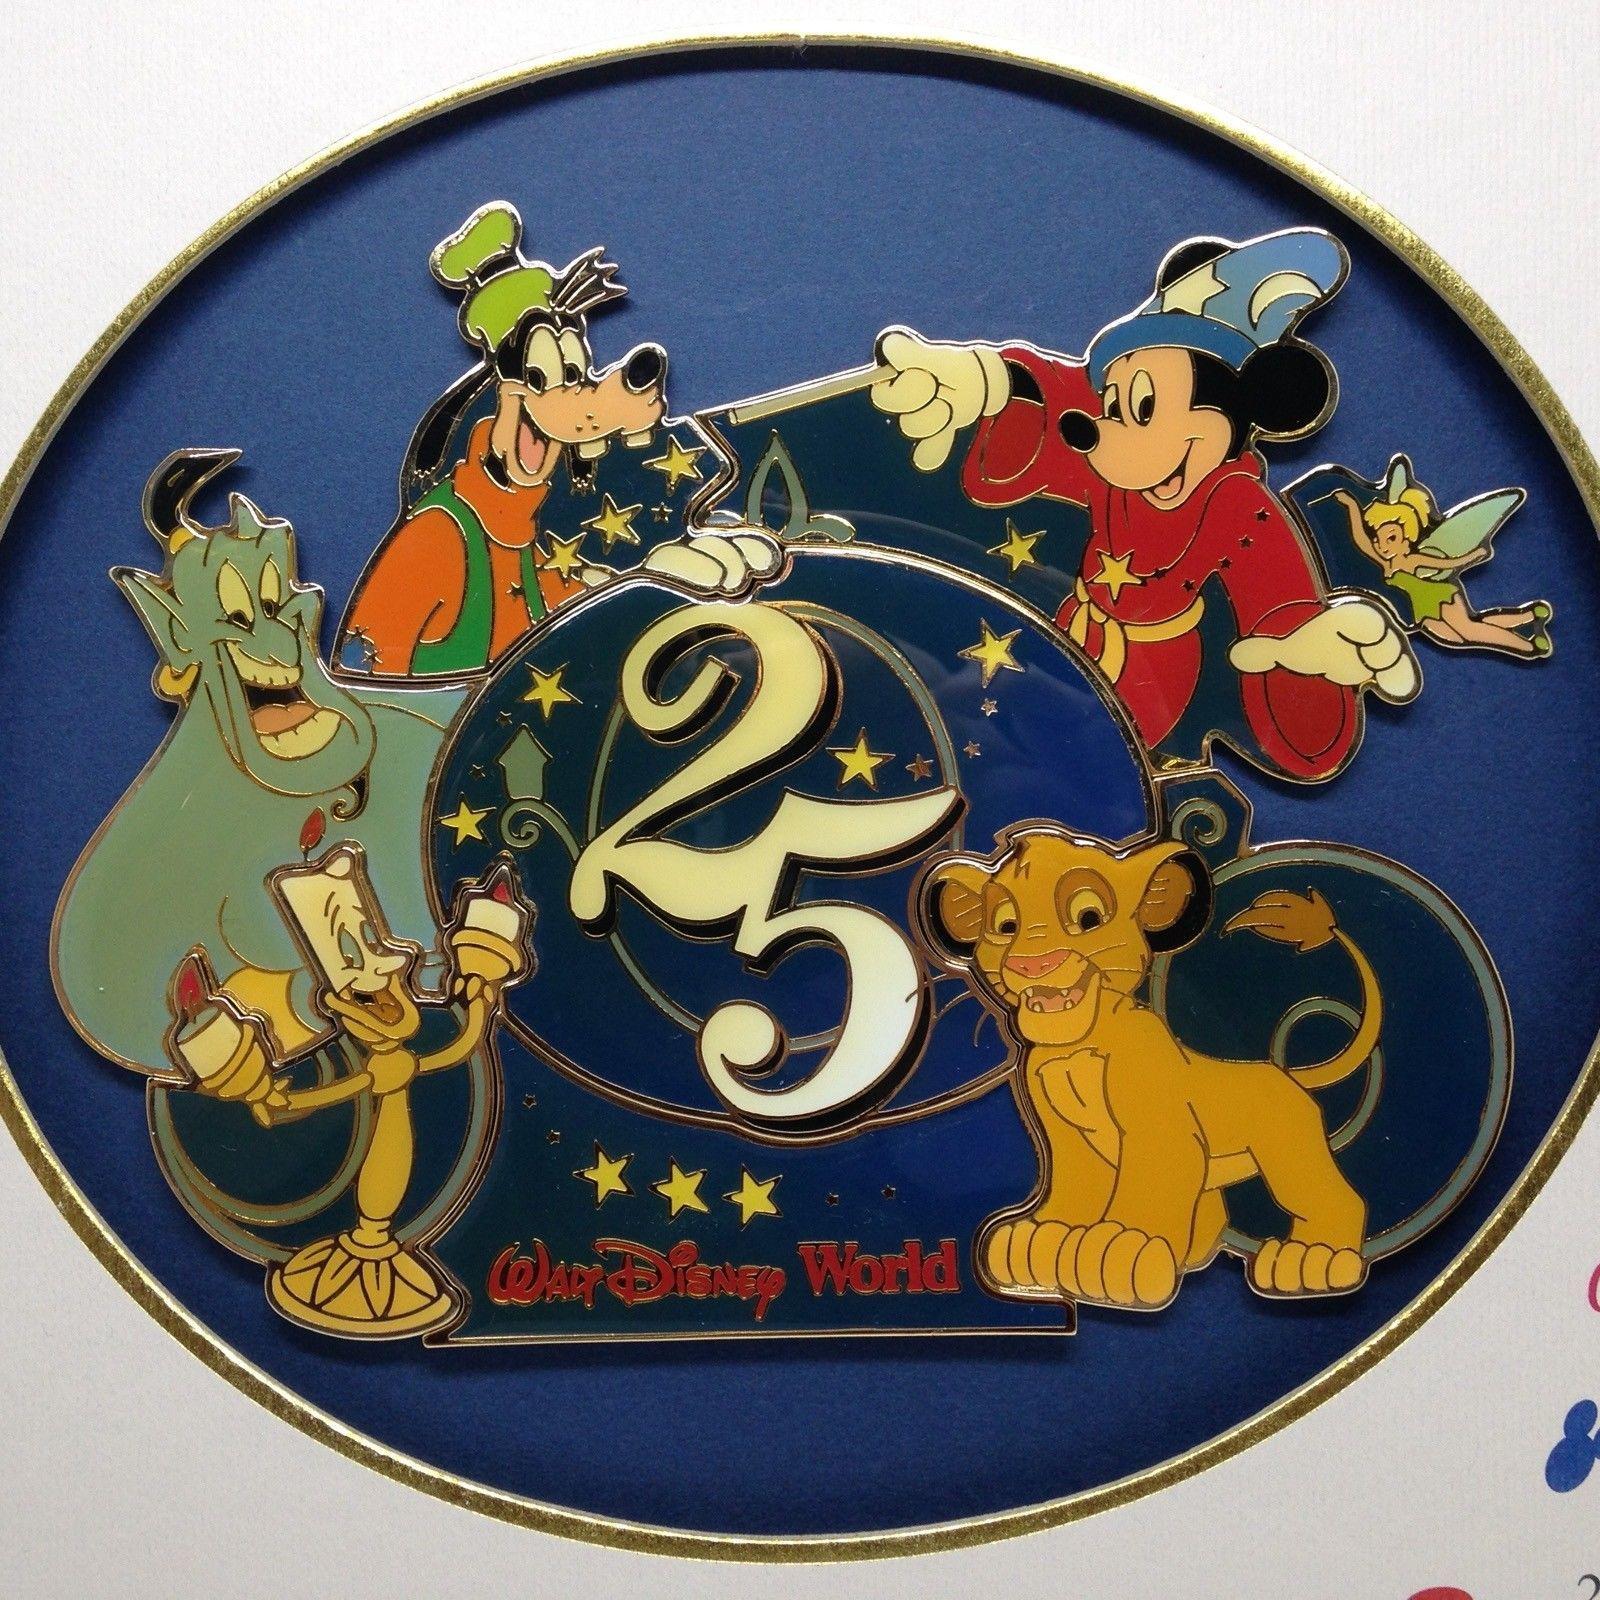 Walt Disney World 25th Anniversary Logo and 50 similar items